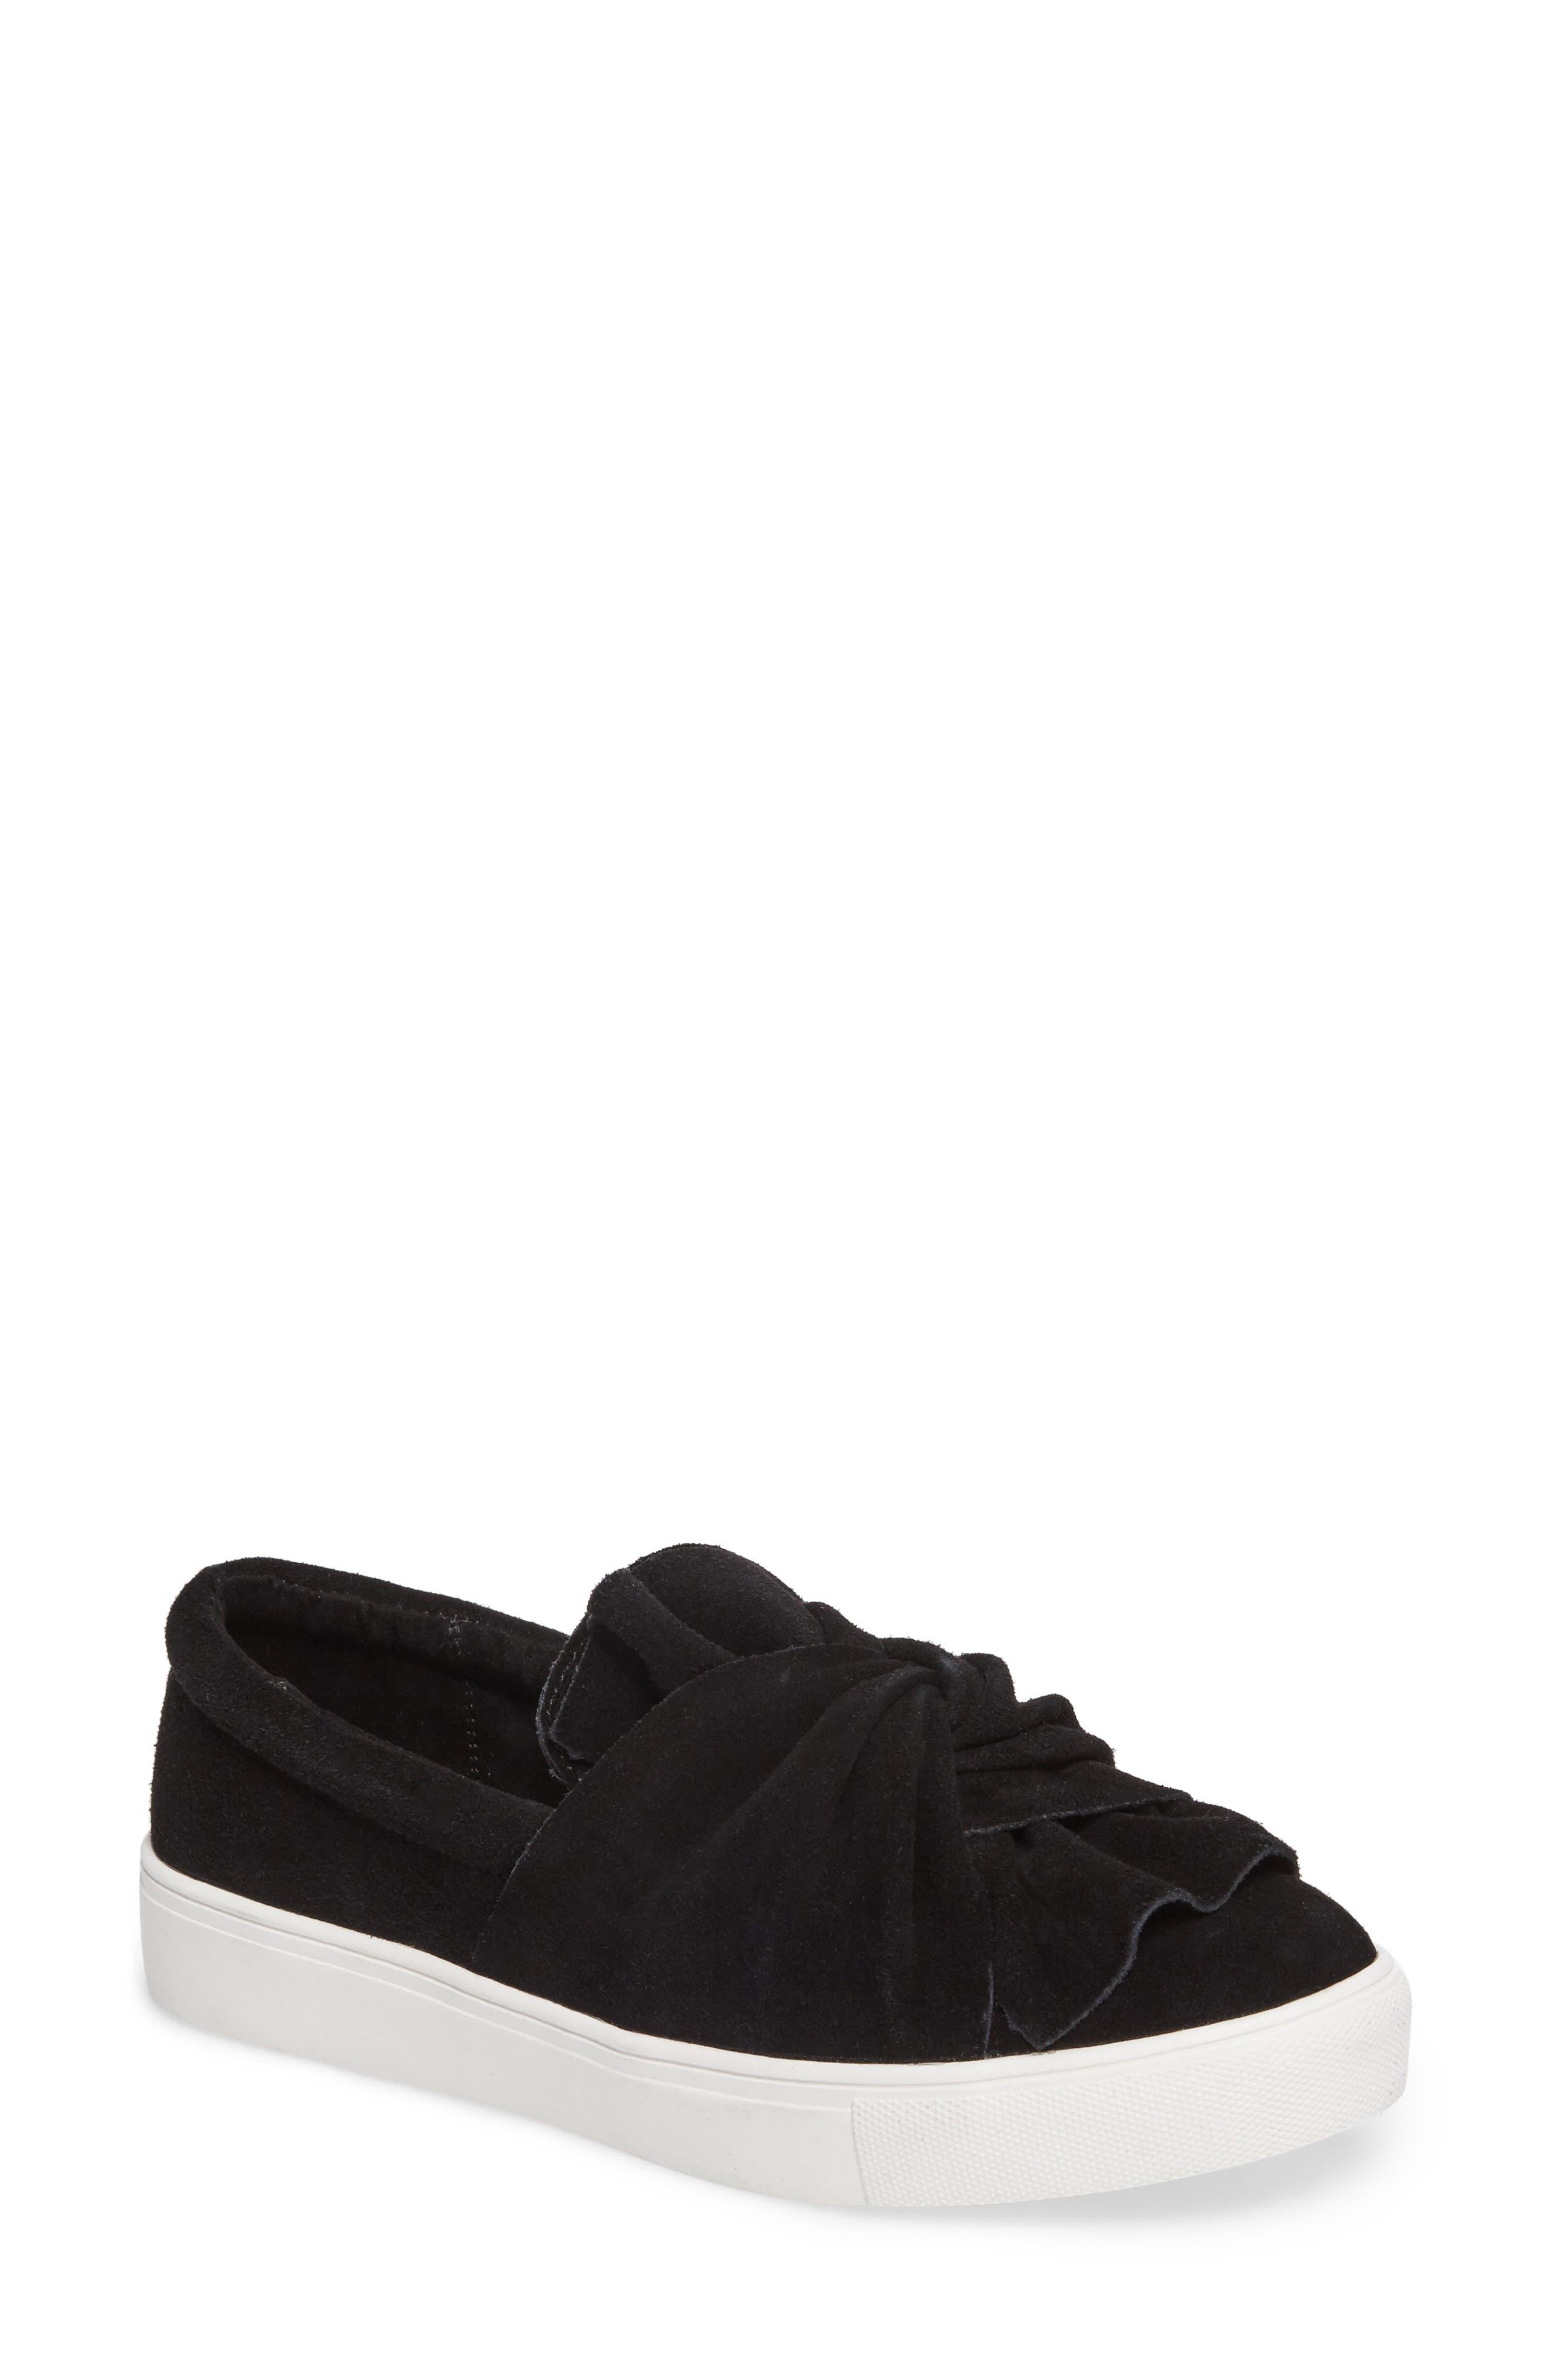 Zahara Slip-On Sneaker,                             Main thumbnail 1, color,                             001